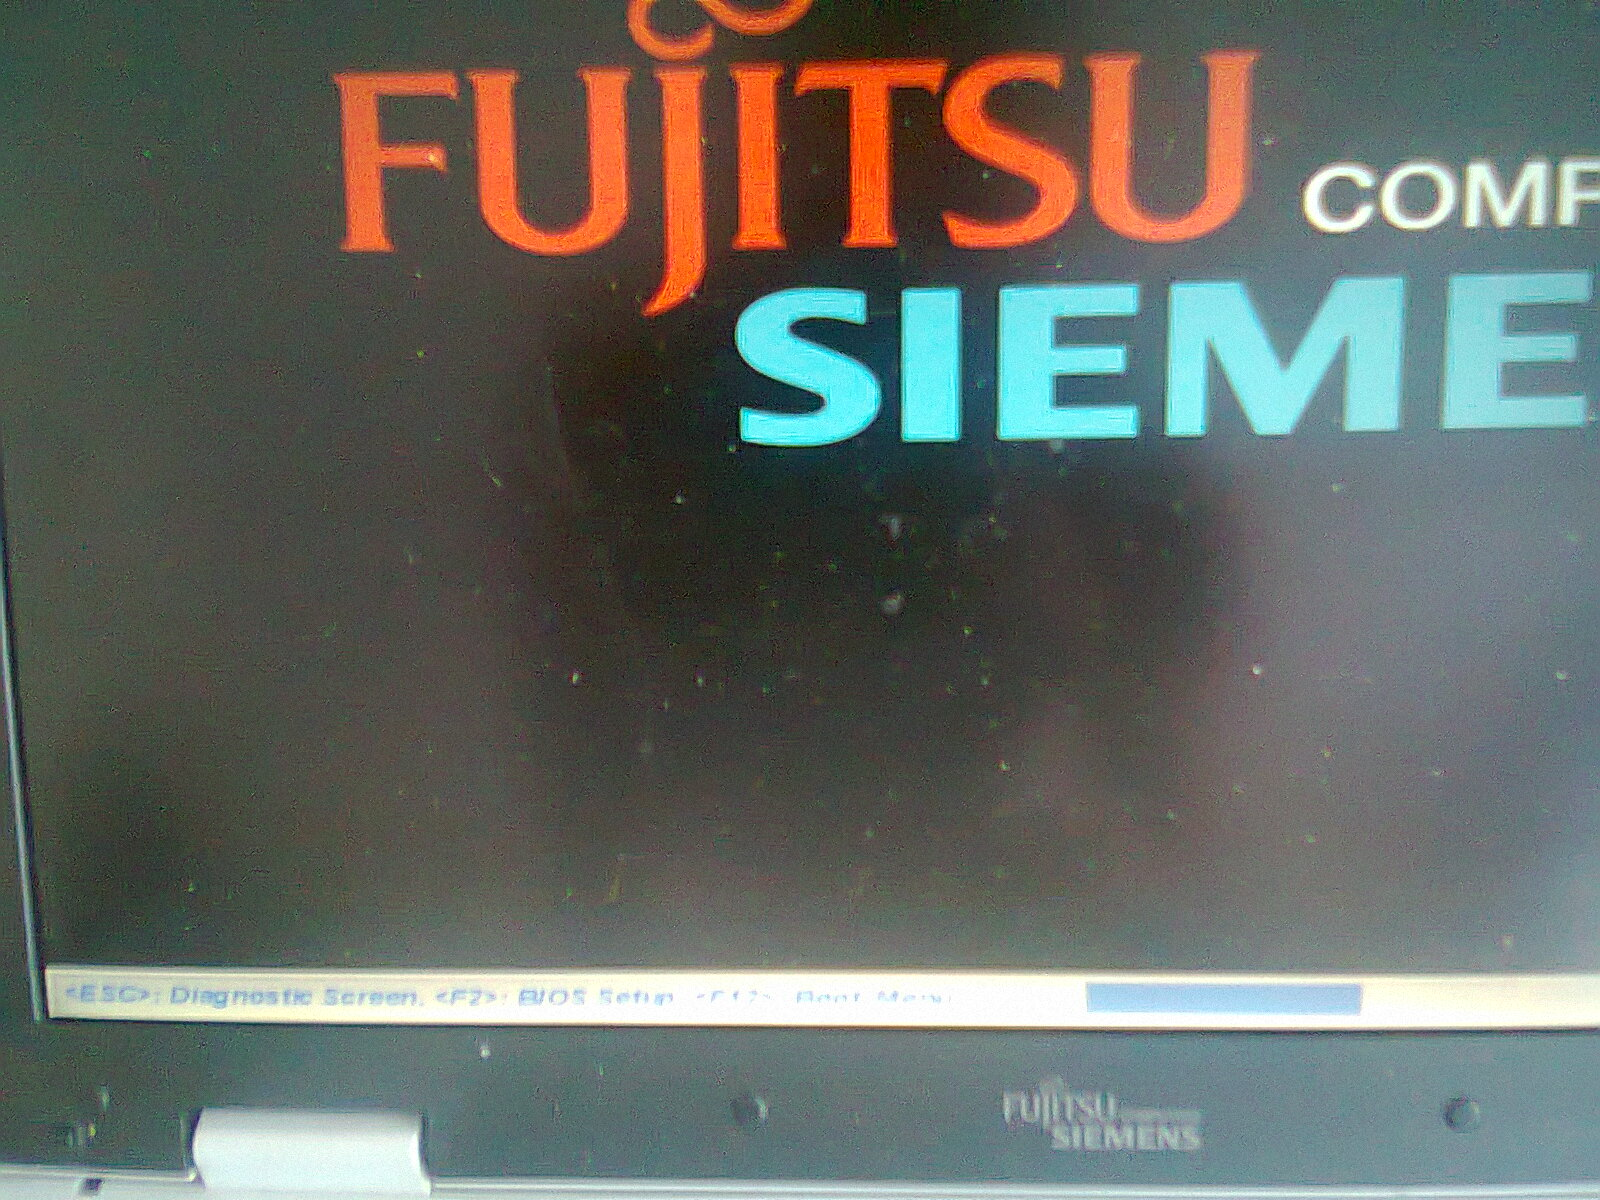 fujitsu  - HM321HI - Nie �aduje systemu b��d PXE-E61: Media test failure